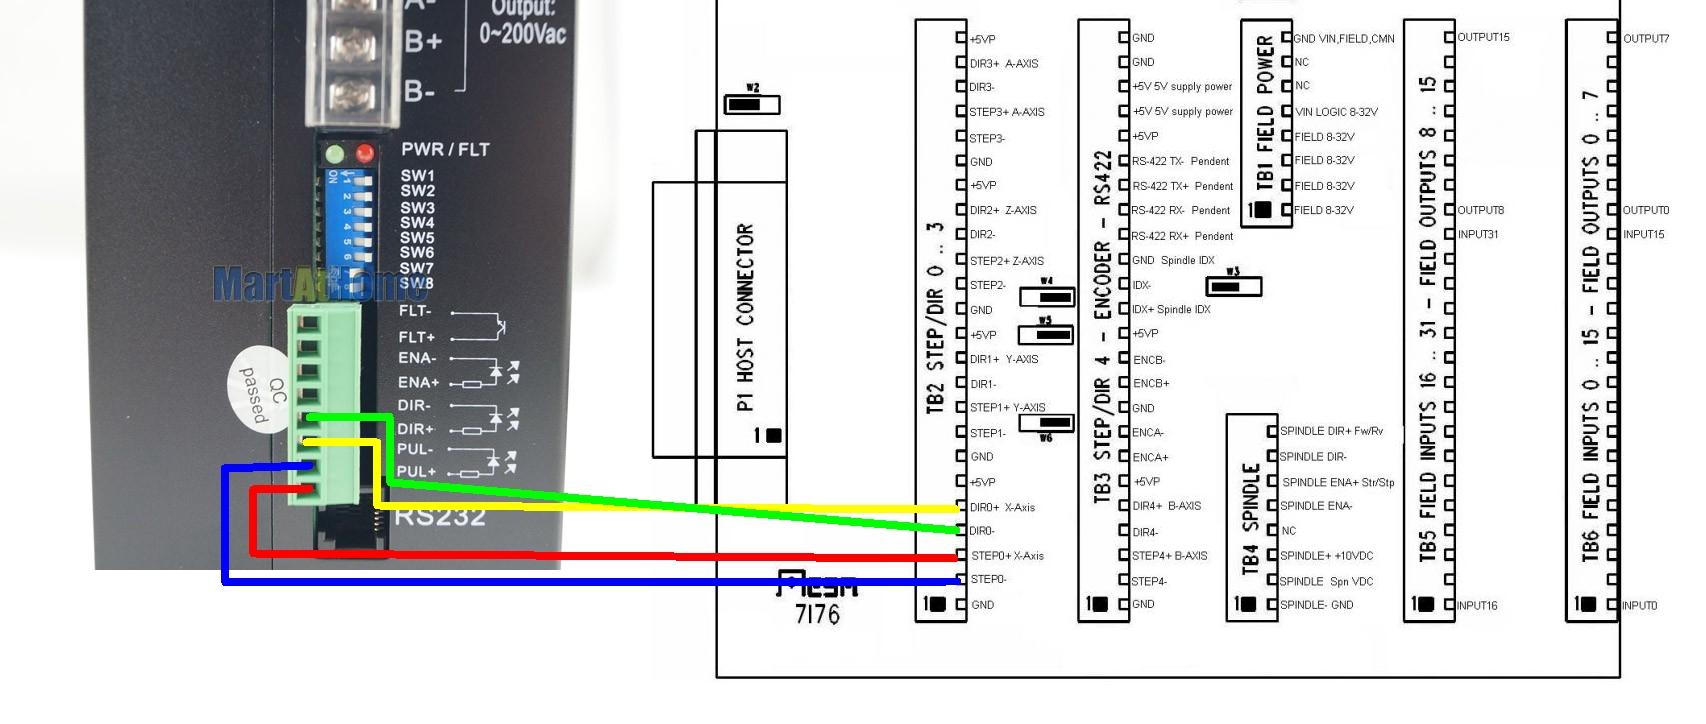 Mesa 5i257i76  driver leadshine DM2282 digital  LinuxCNC